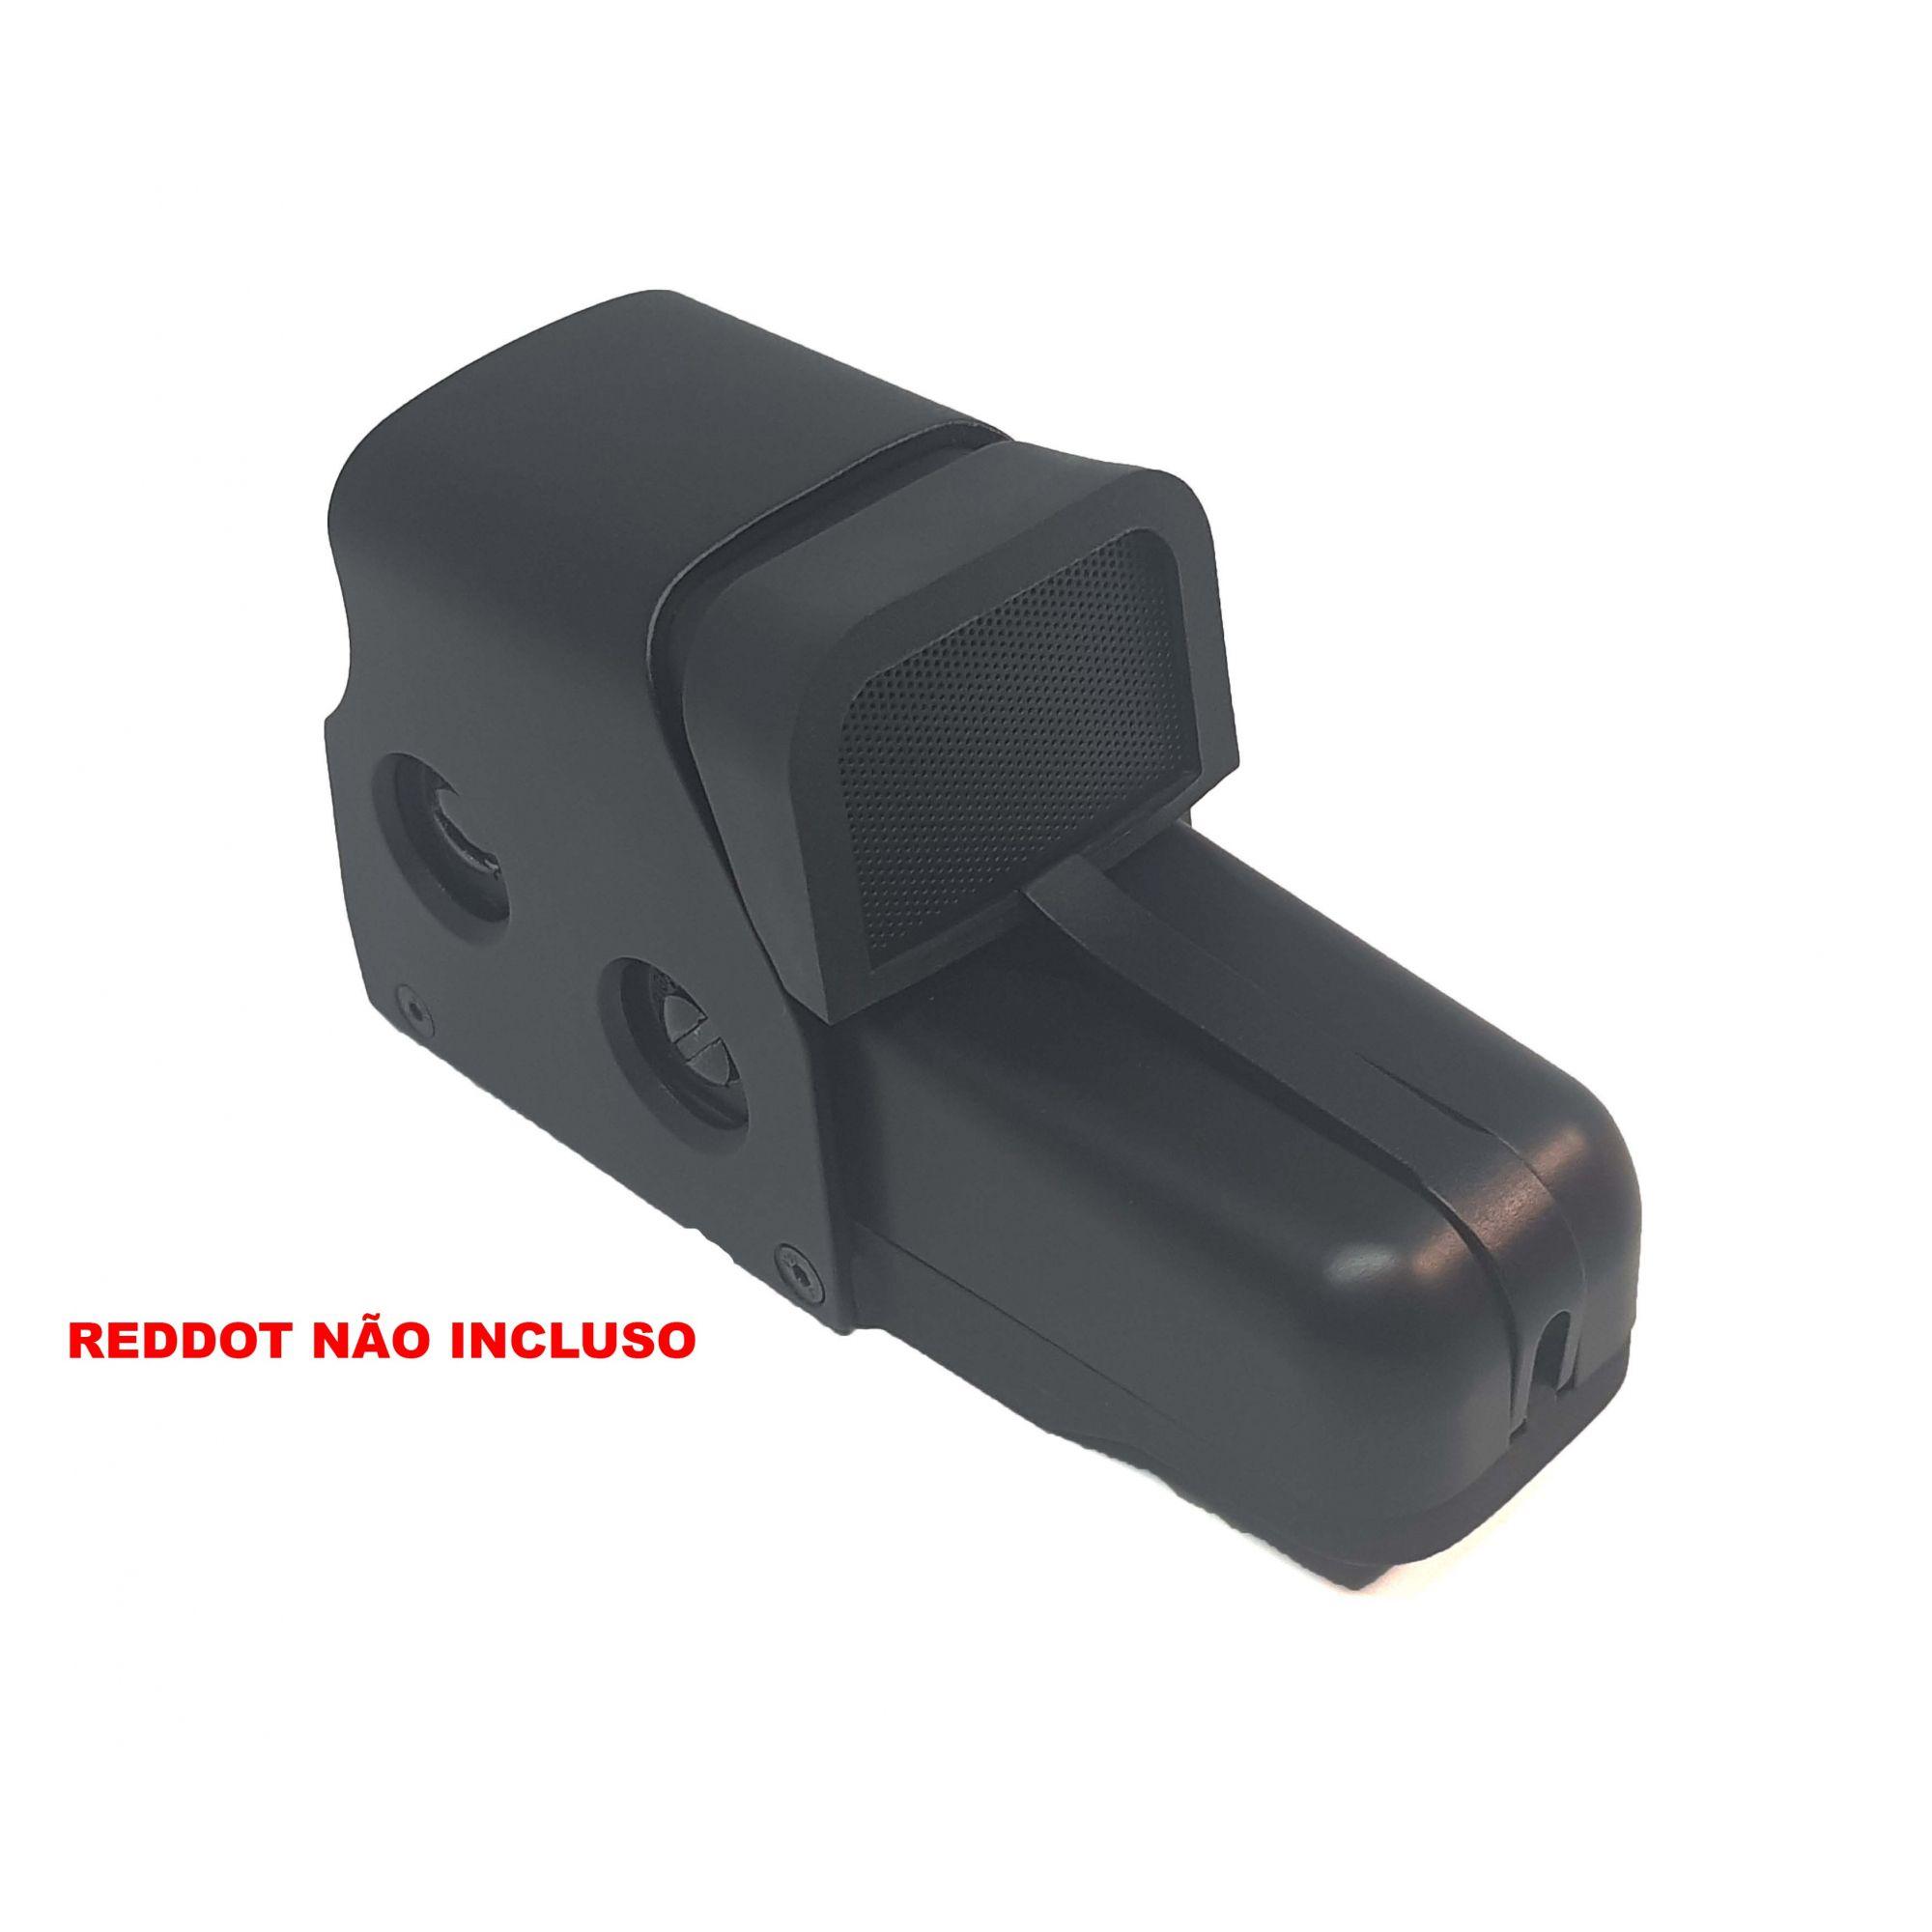 Protetor De Reddot (grade Alum¡nio) Anti Reflexo